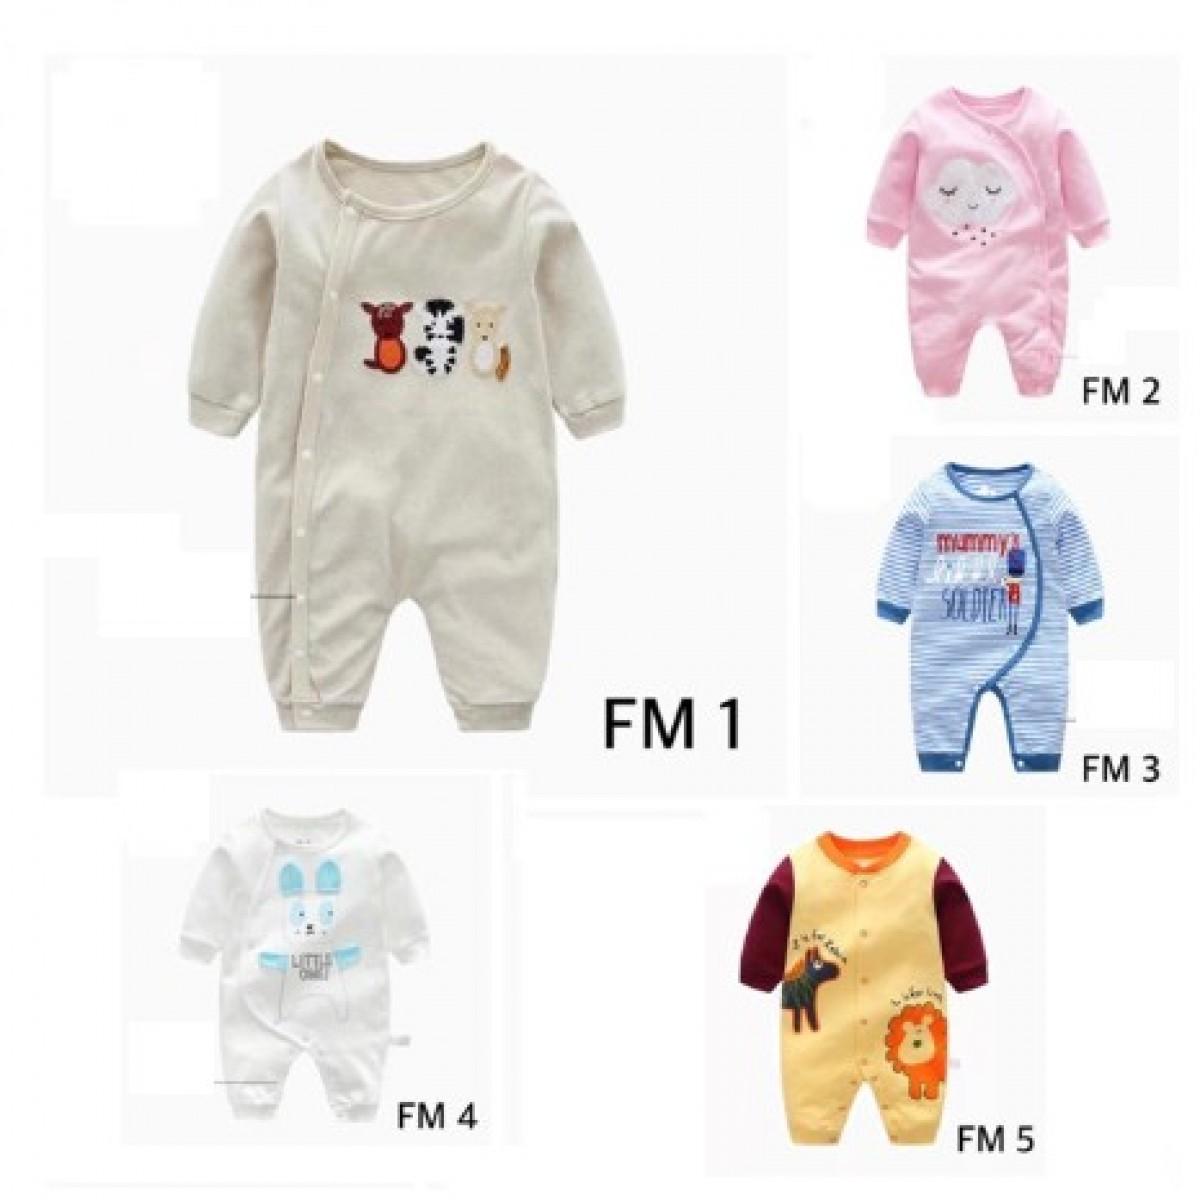 Jumper FM (firstmovement) tanpa kaki - Bunda Ina Shop